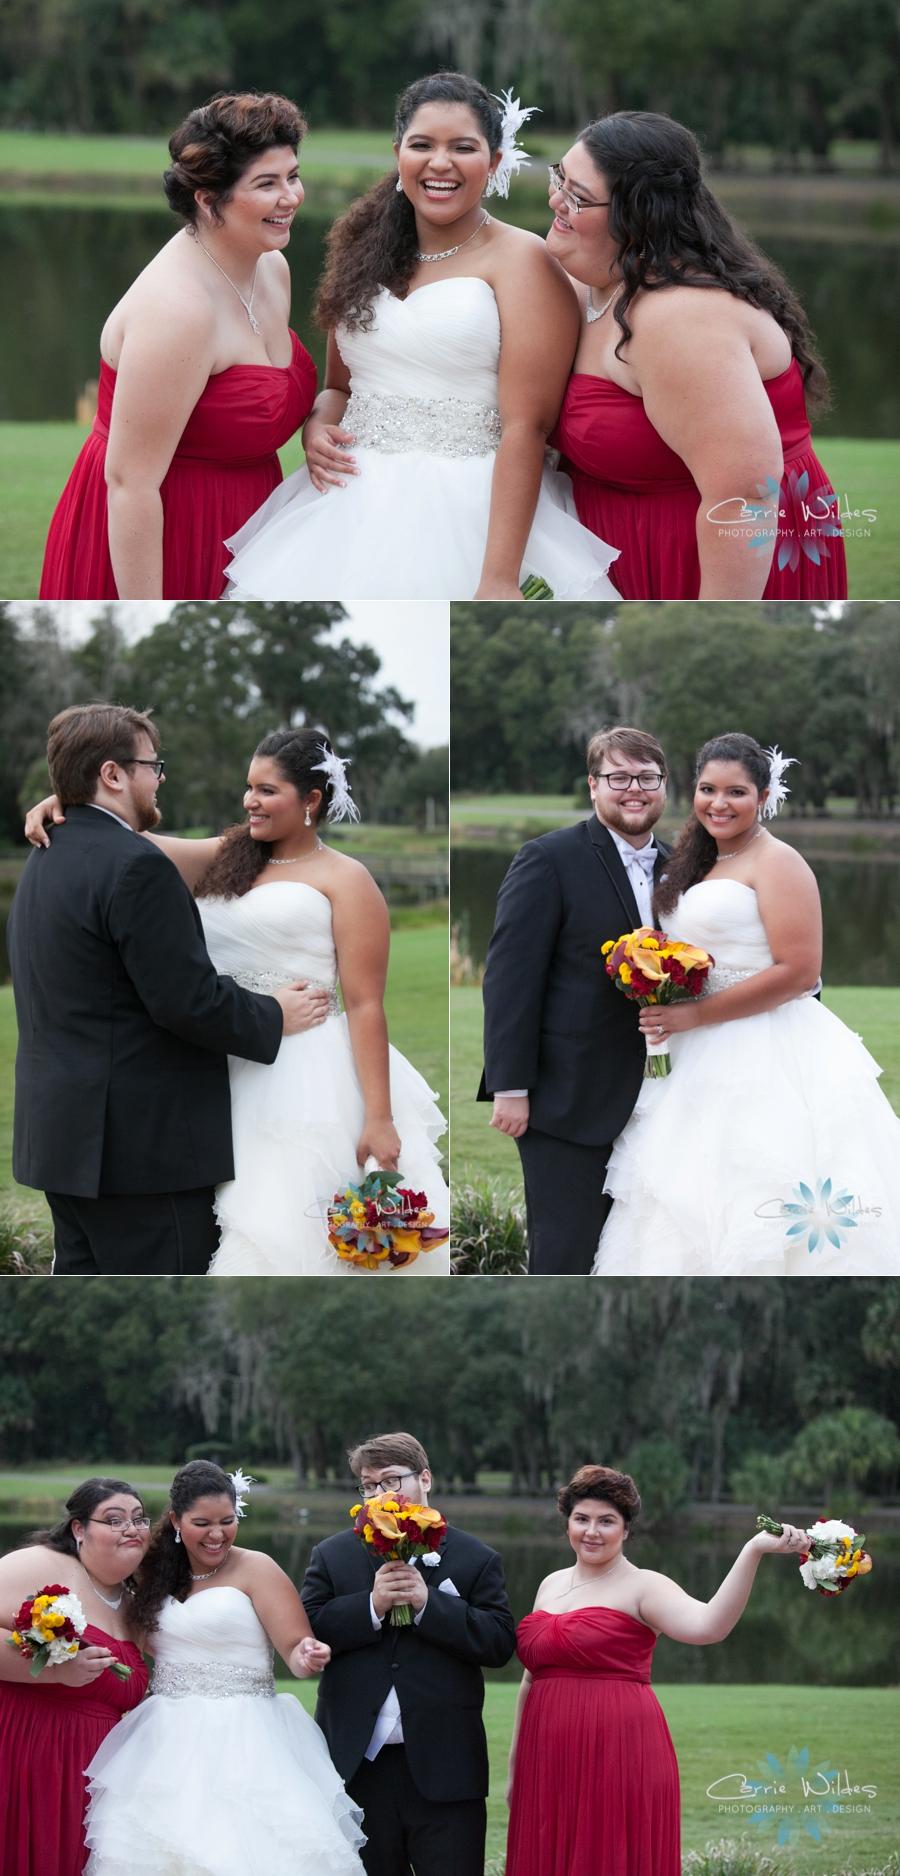 11_21_15 Tampa Palms Wedding_0011.jpg